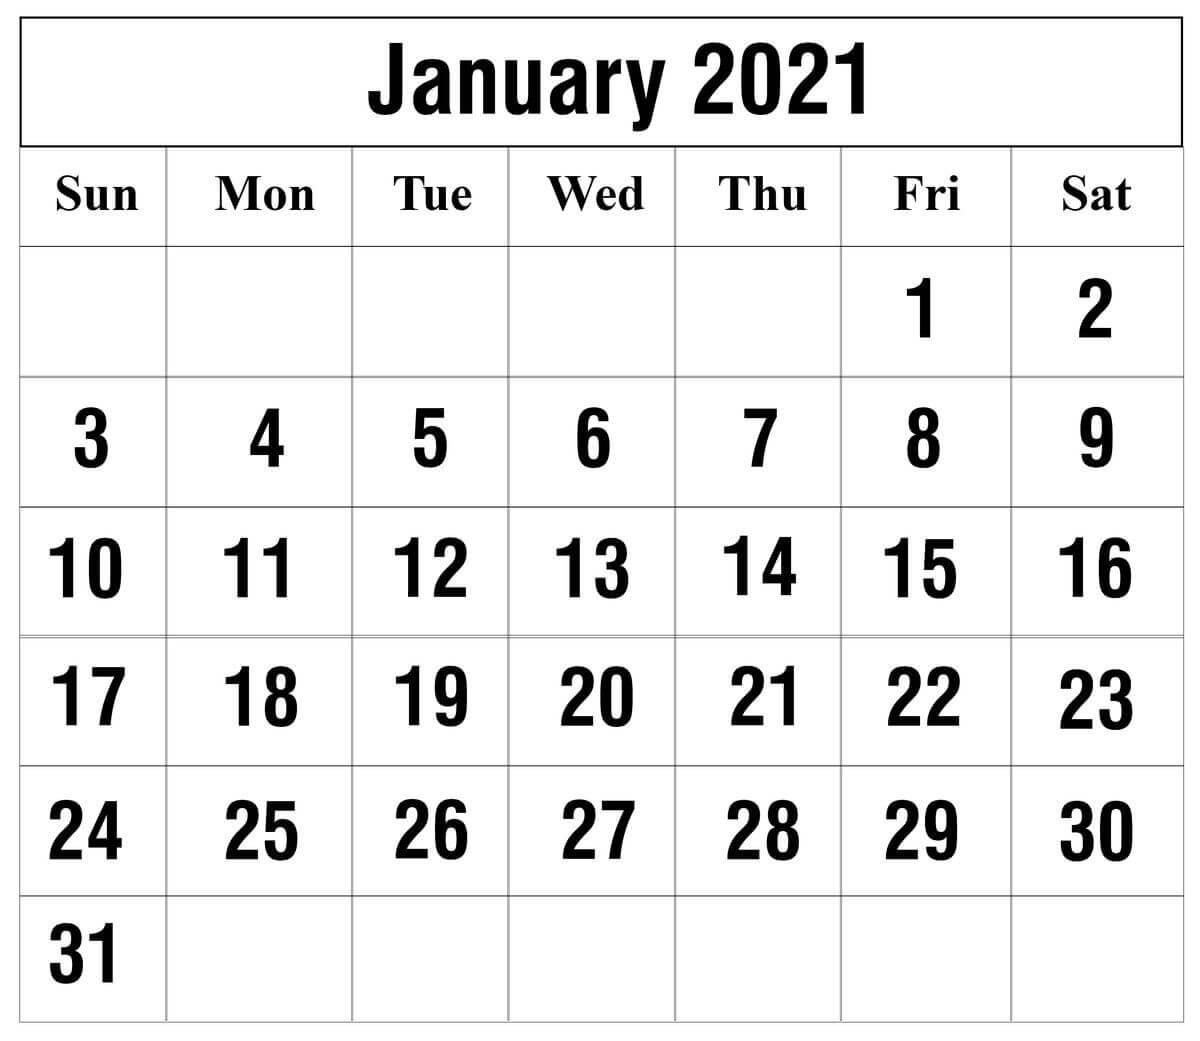 Monthly Calendar January 2021